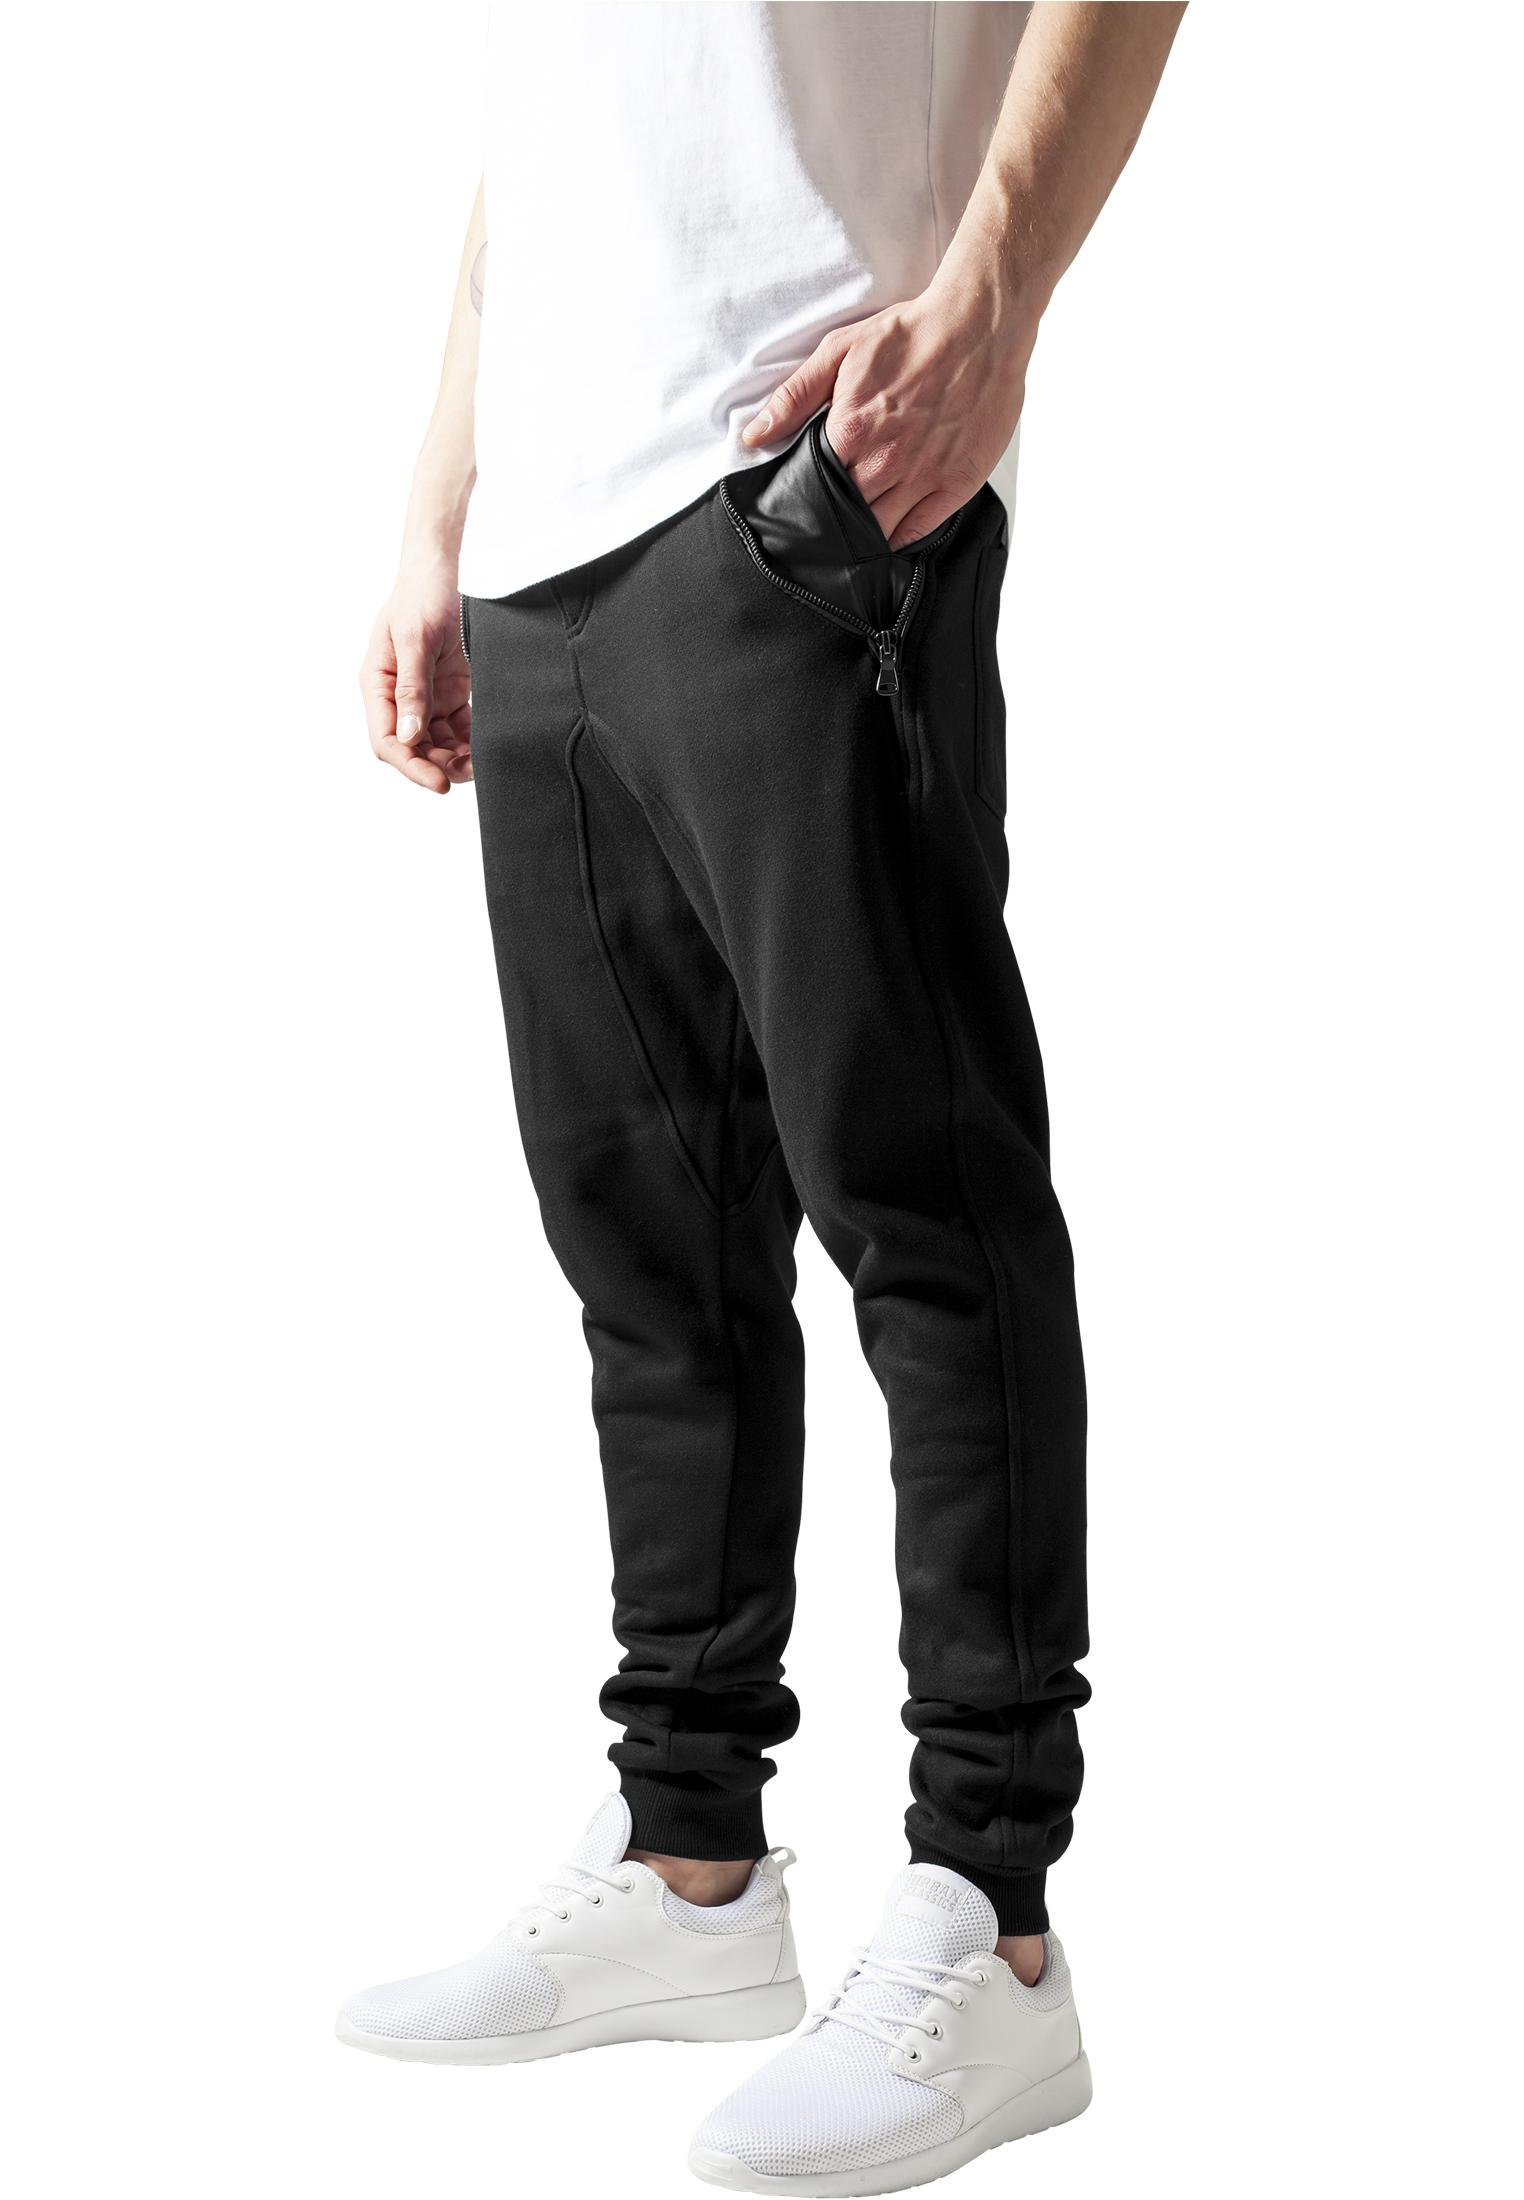 Urban Classics Side Zip Leather Pocket Sweatpant blk/blk - S